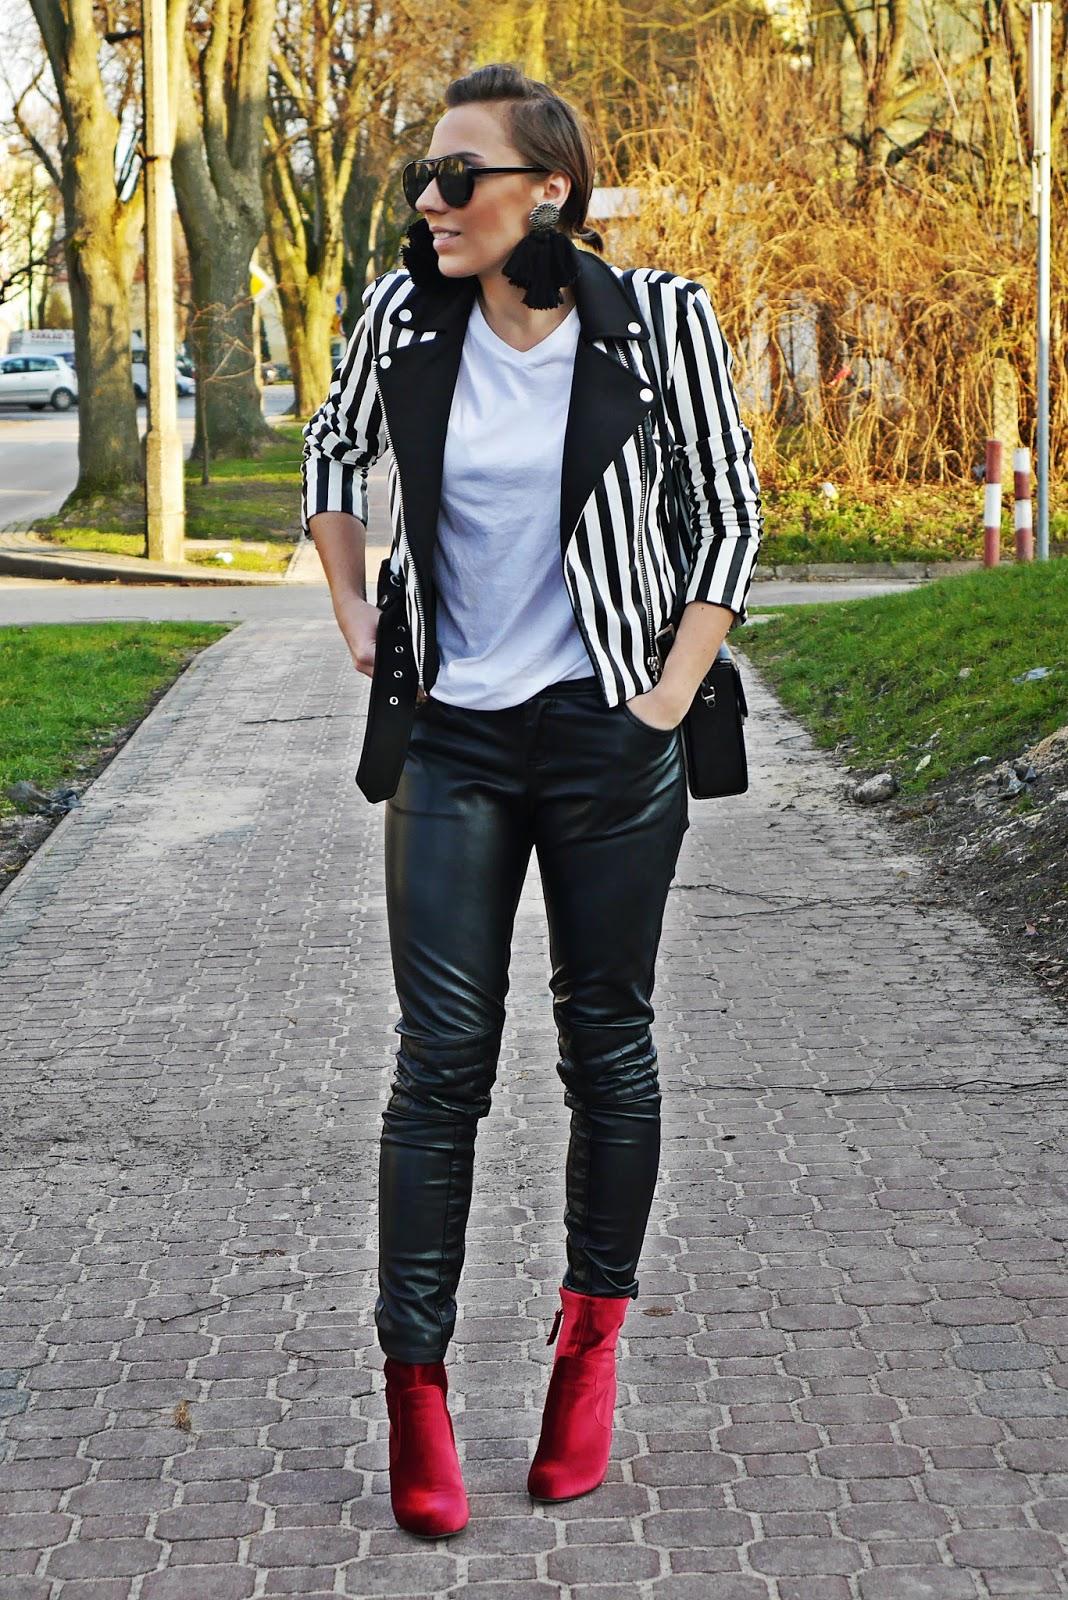 1_leather_pants_stripes_biker_jacket_red_velvet_white_tshirt_karyn_blog_modowy_111217a